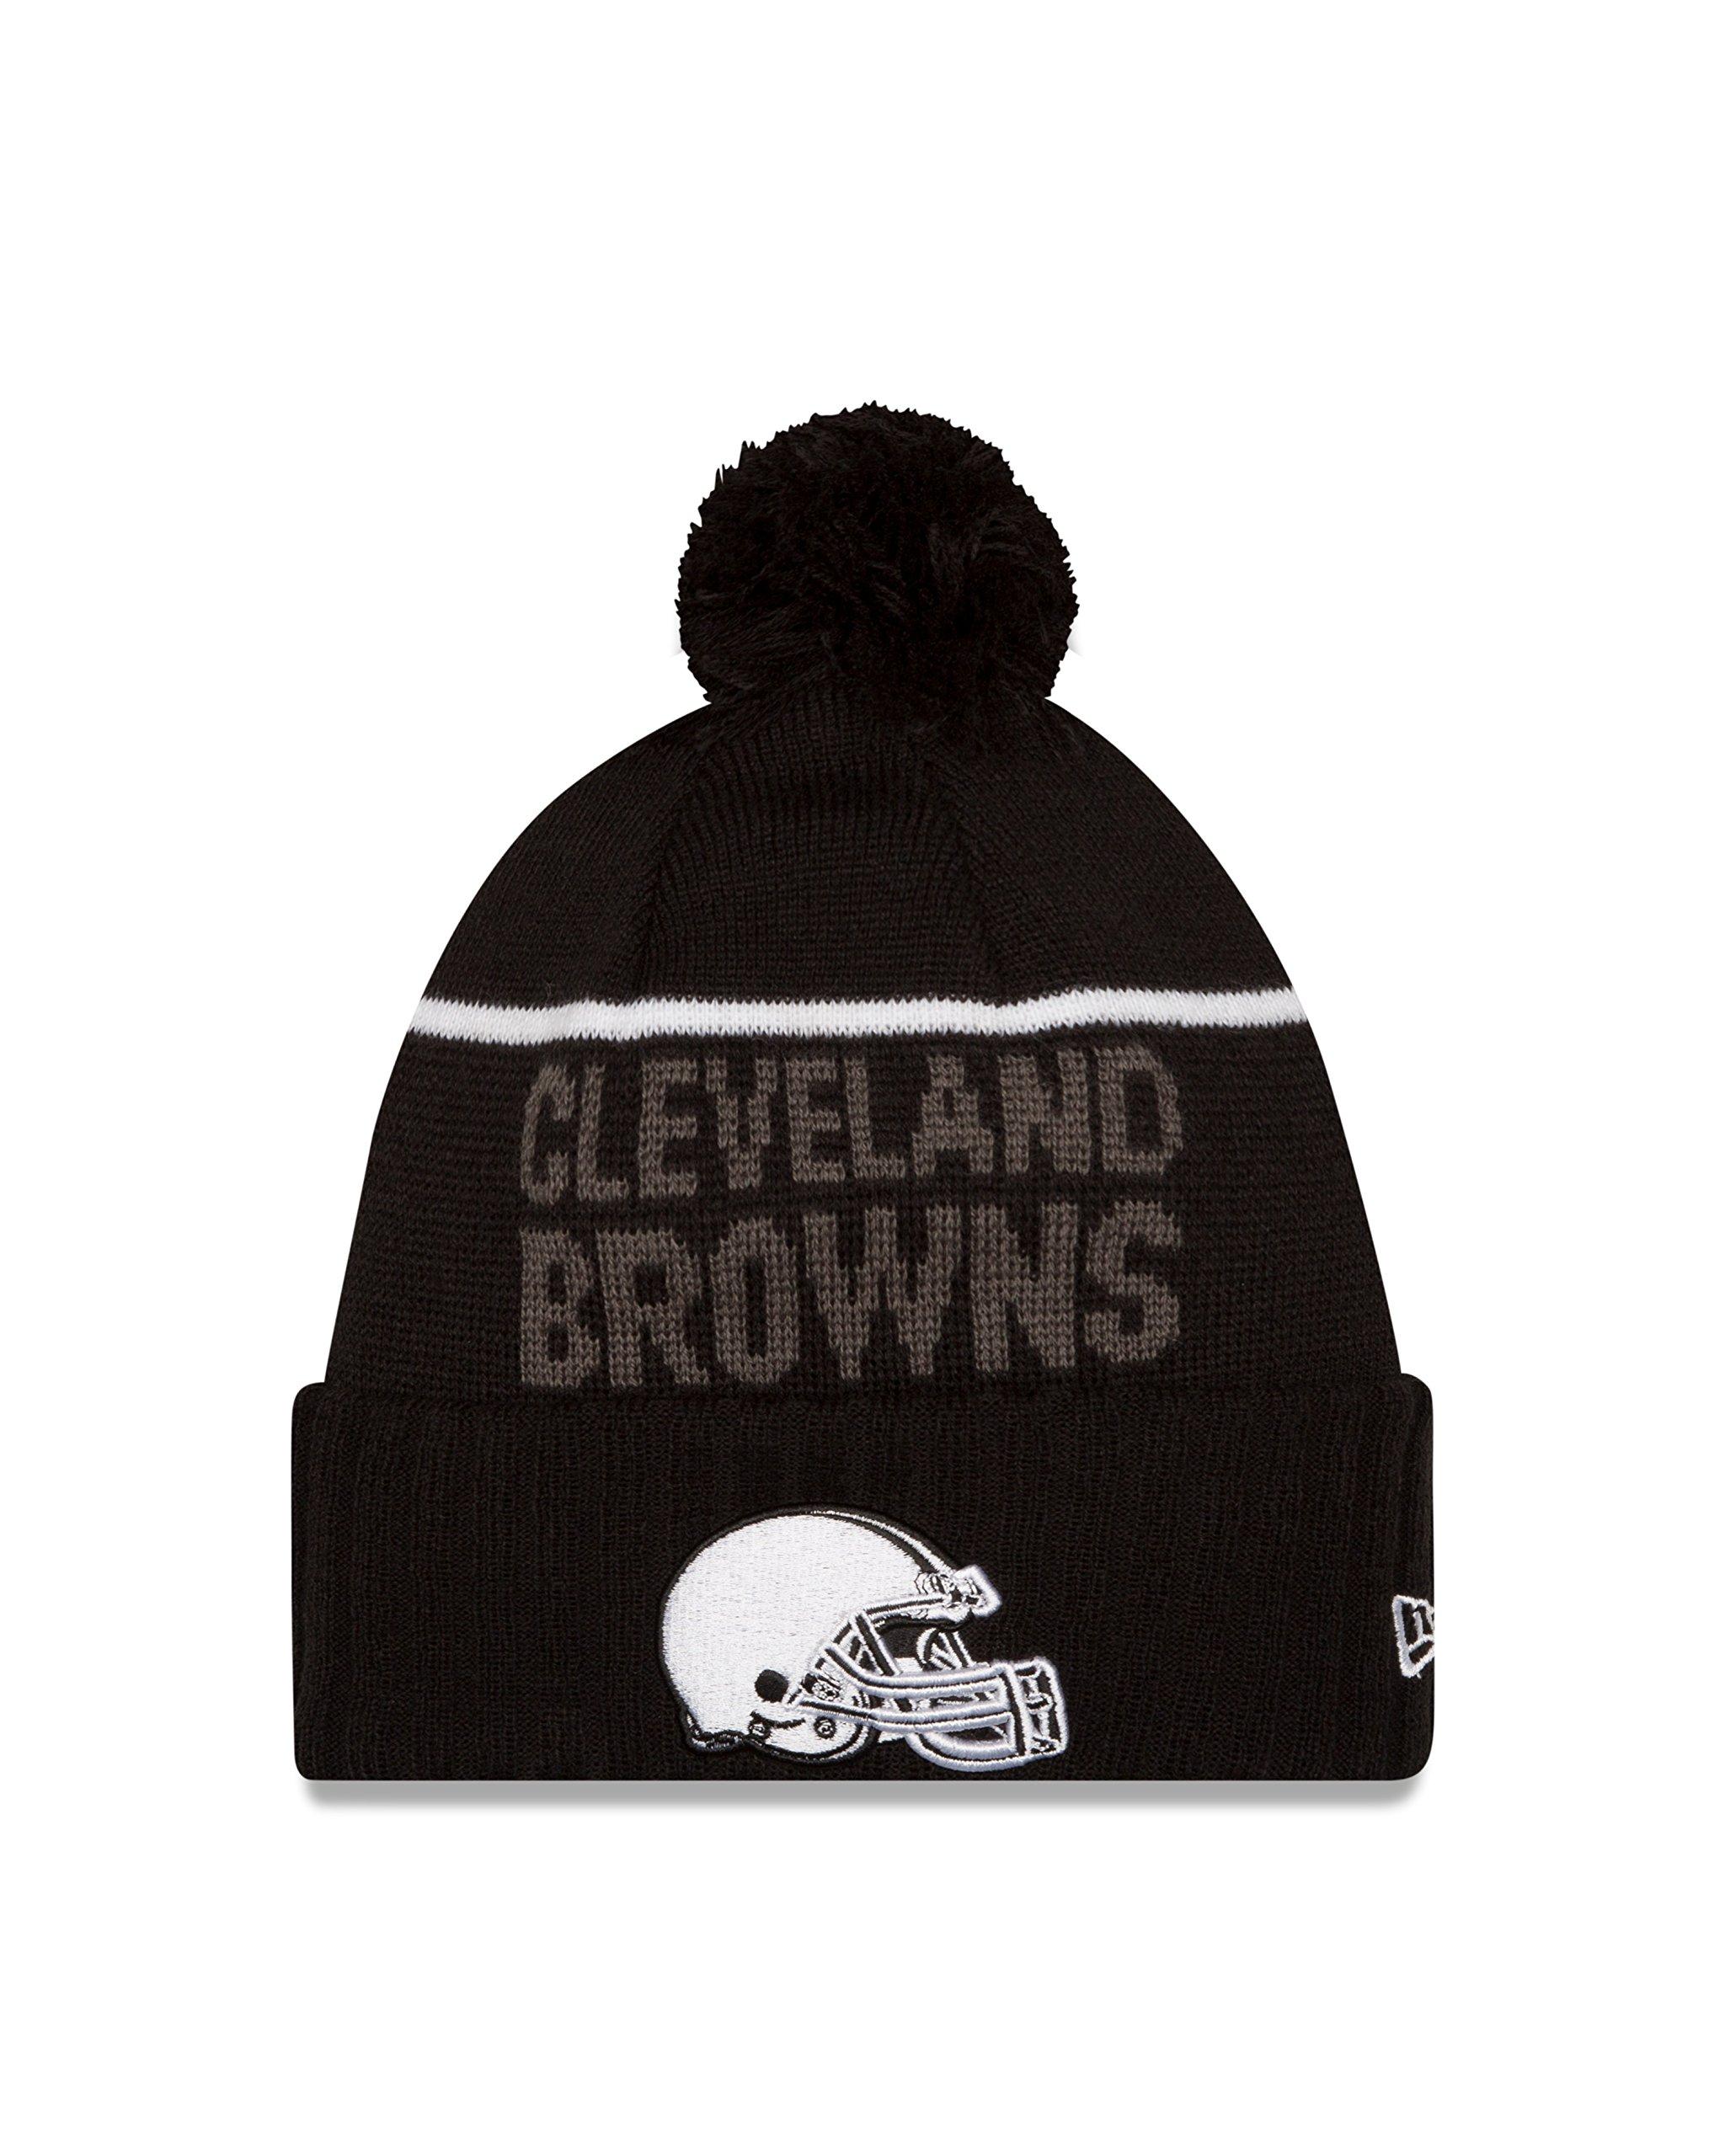 NFL Cleveland Browns 2015 Sport Knit, Black, One Size